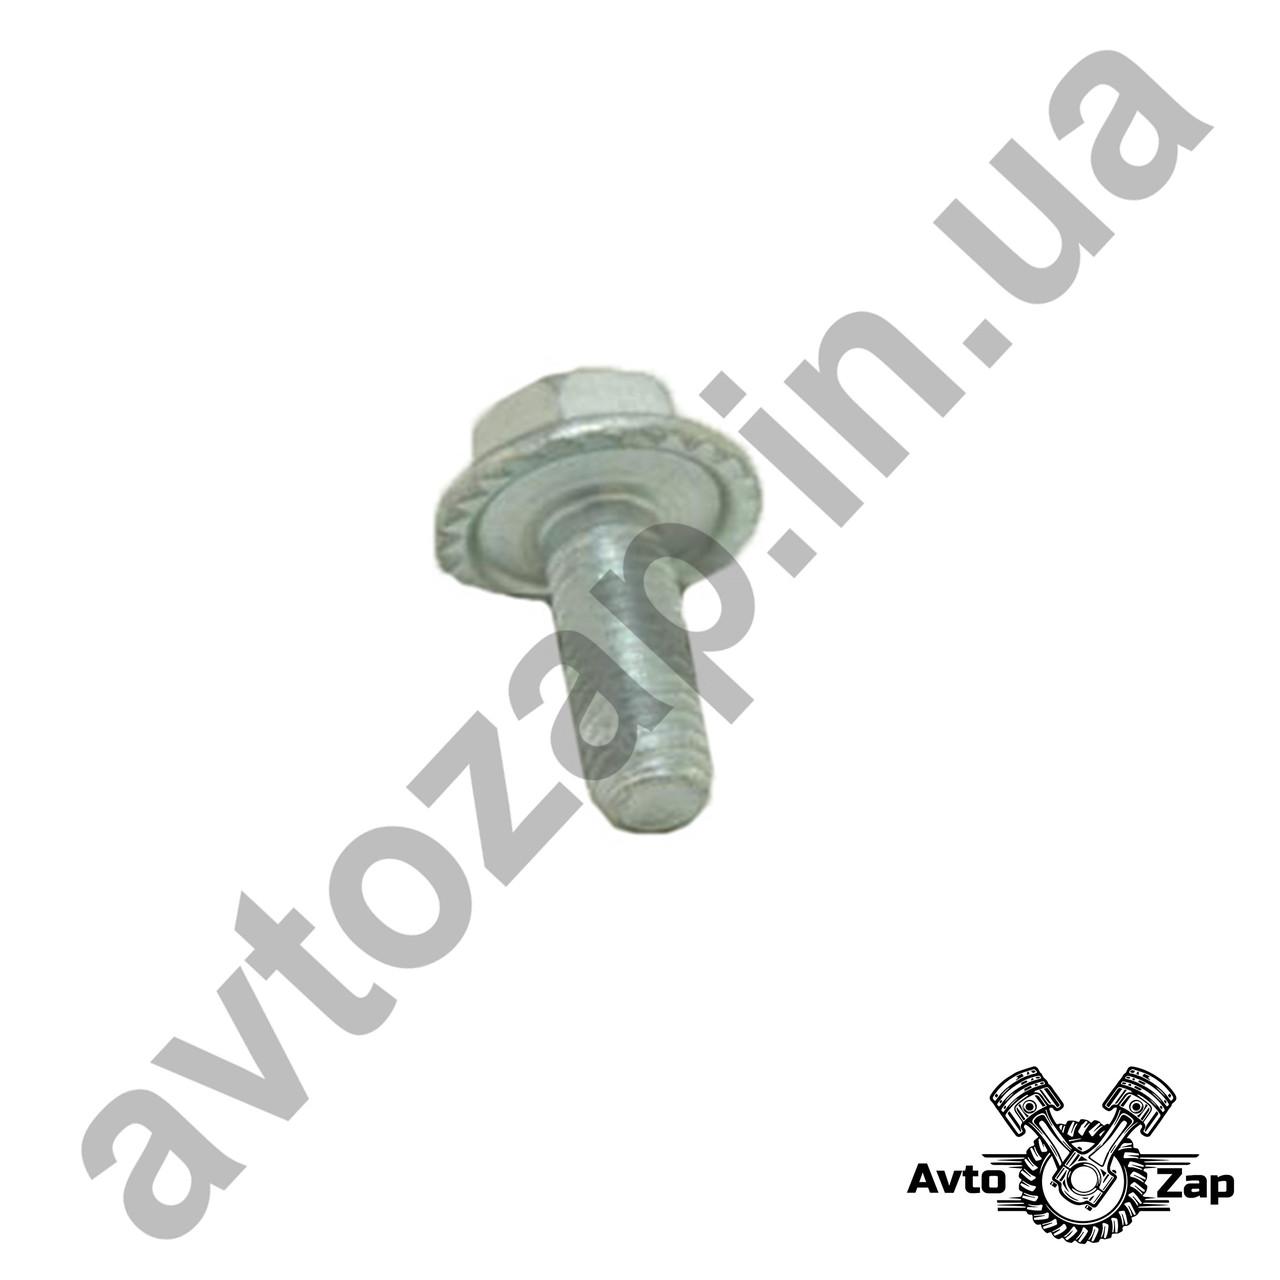 Болт  М8х20  кронштейна бампера ВАЗ 2101-07 с юбкой (20 шт.) п/э уп .  35785